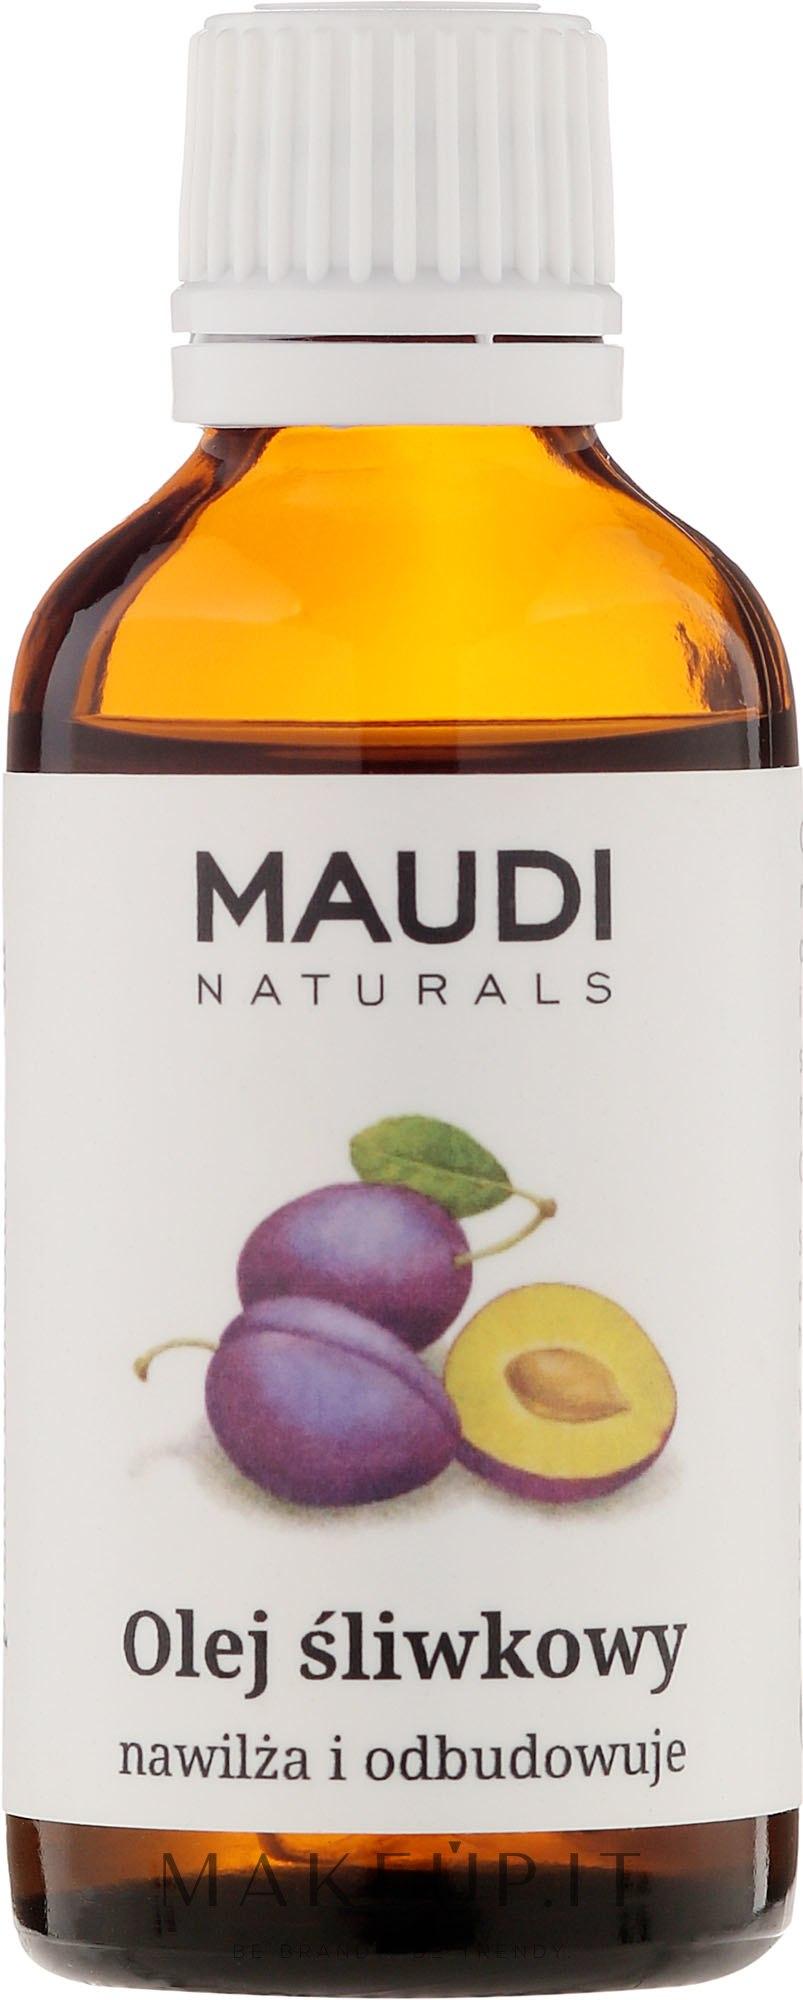 Olio di prugne - Maudi — foto 50 ml